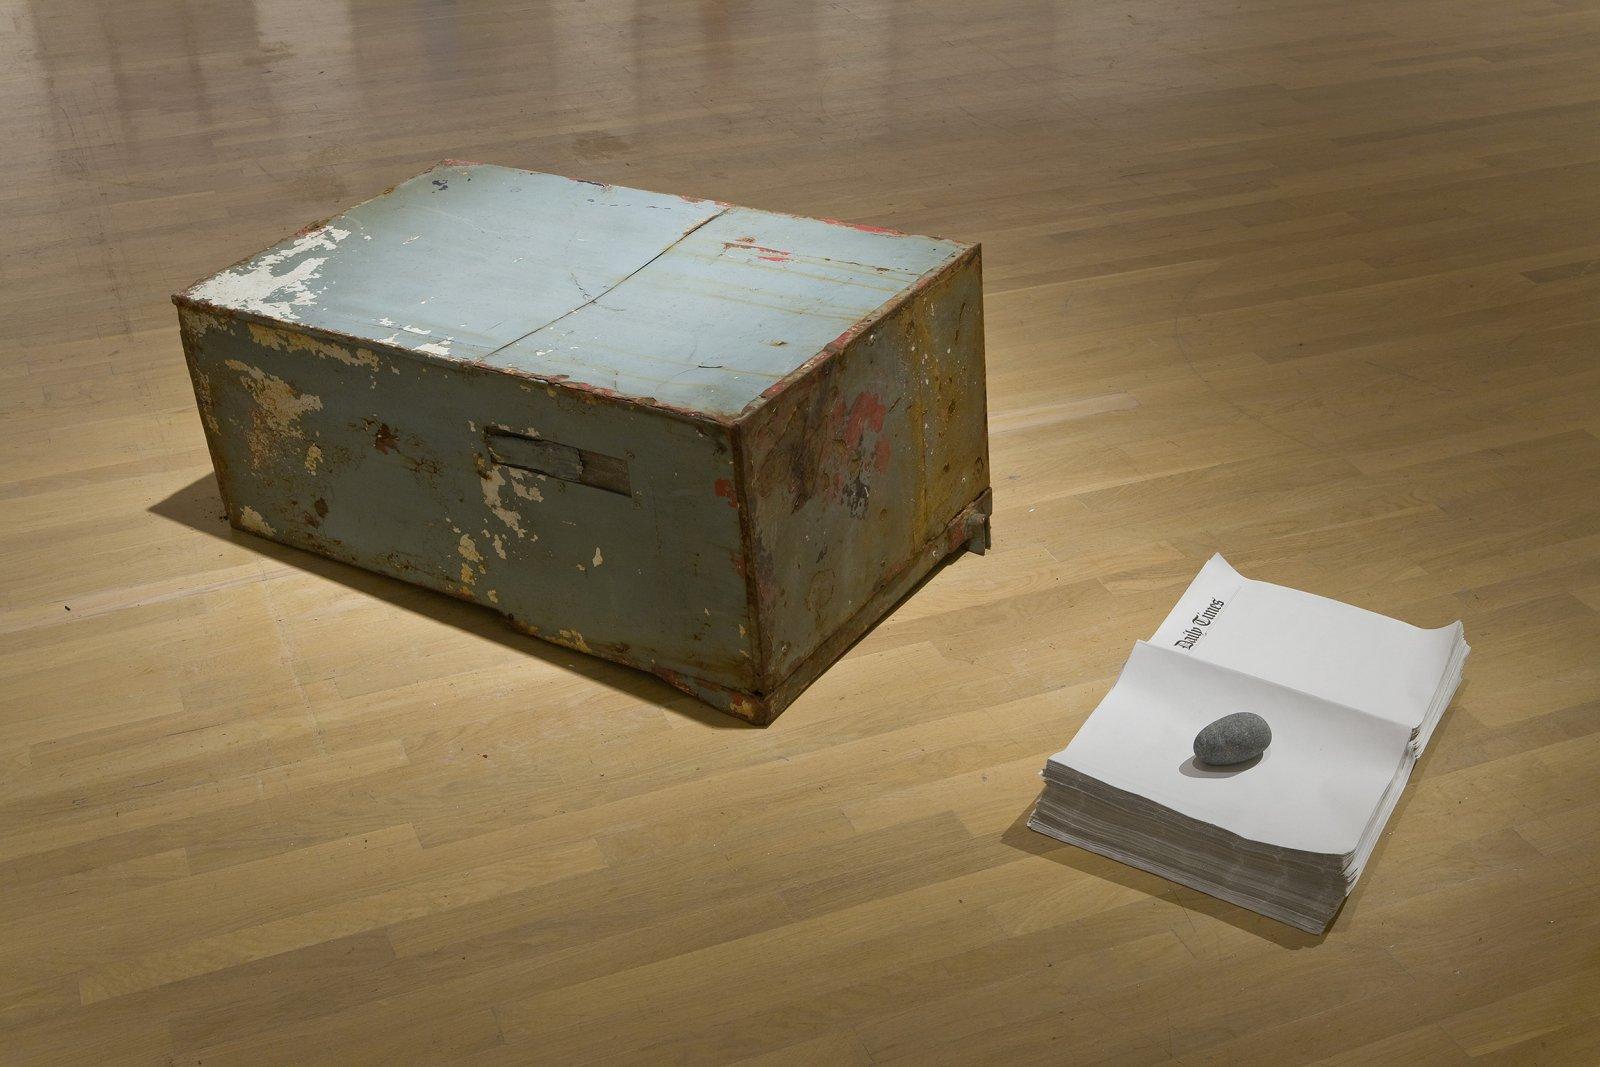 Geoffrey Farmer,Streak of Light, 2001–2007, prop newspaper box, newspapers with paperweight, 18 x 24 x 62 in. (46 x 61 x 157 cm)